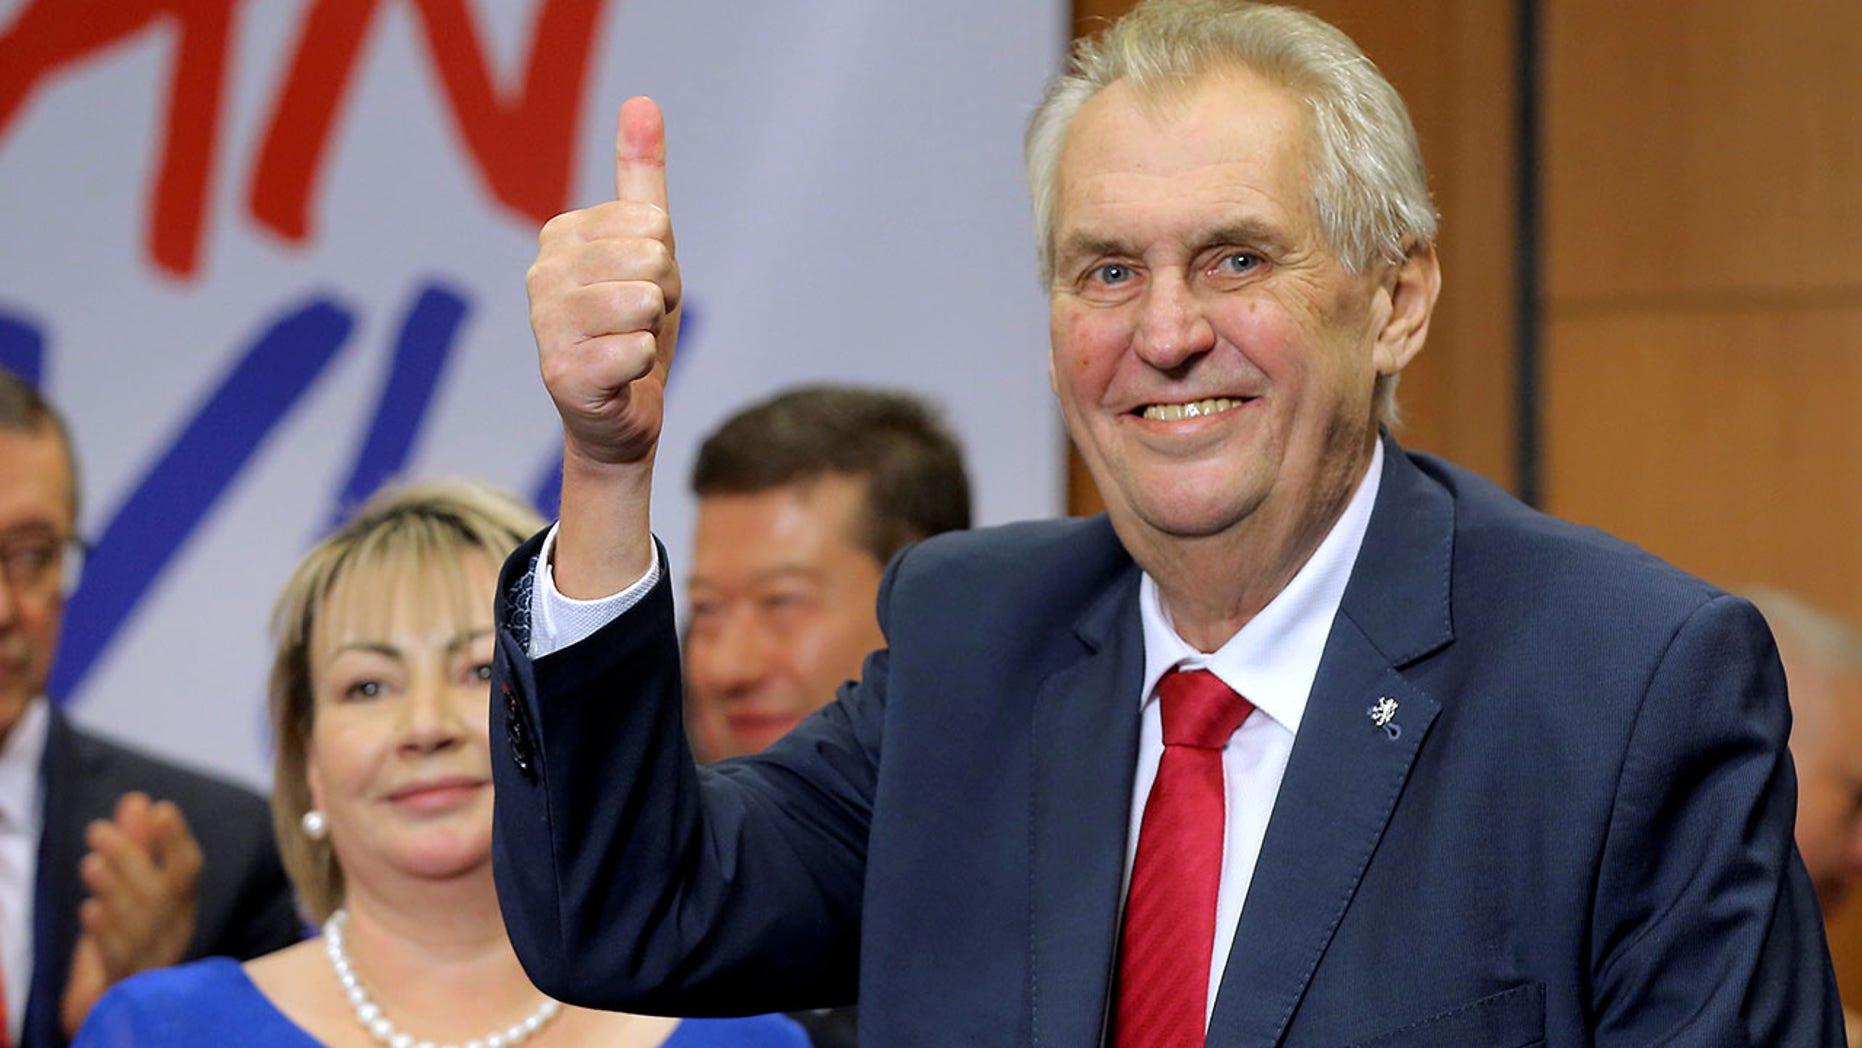 Czech President Milos Zeman defeated challenger Jiri Drahos in a presidential runoff Saturday.